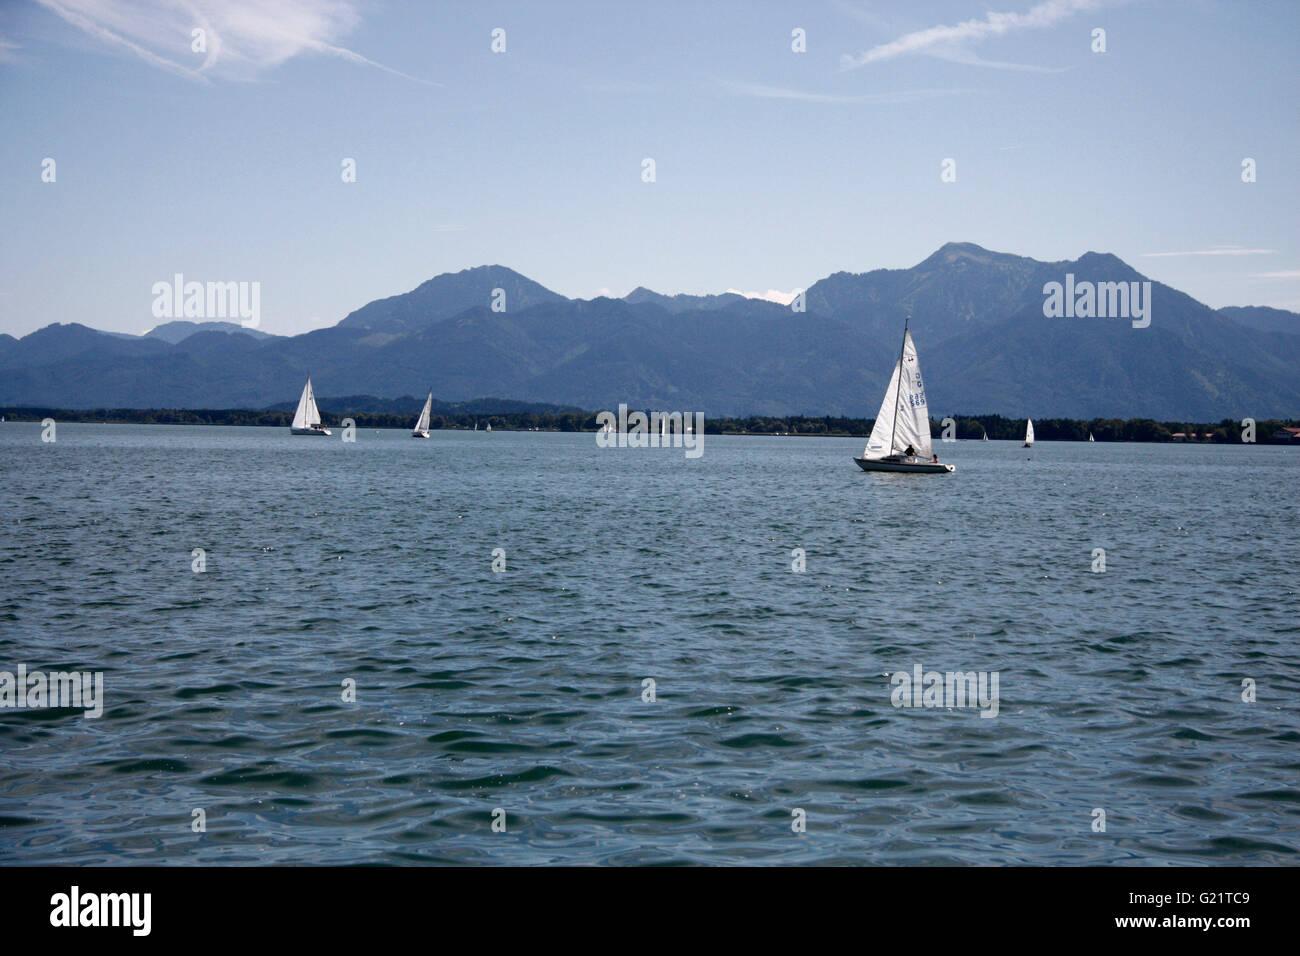 Chiemsee, Bayern. - Stock Image